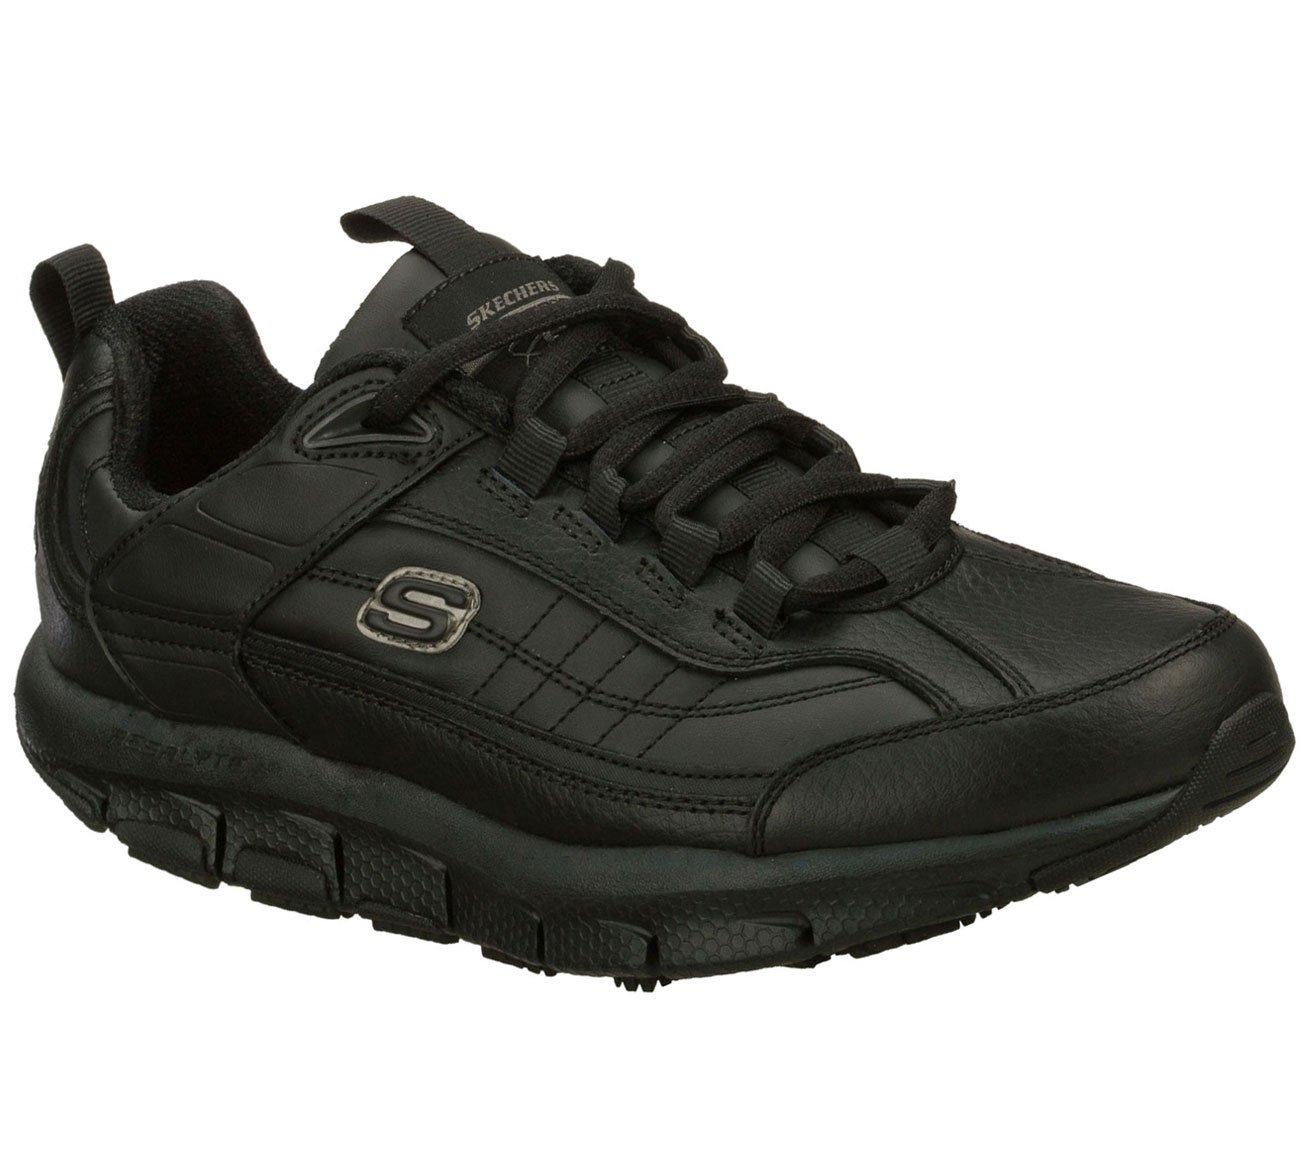 Skechers Men's Liv SR - Brawny Black Leather 9.5 EW by Skechers